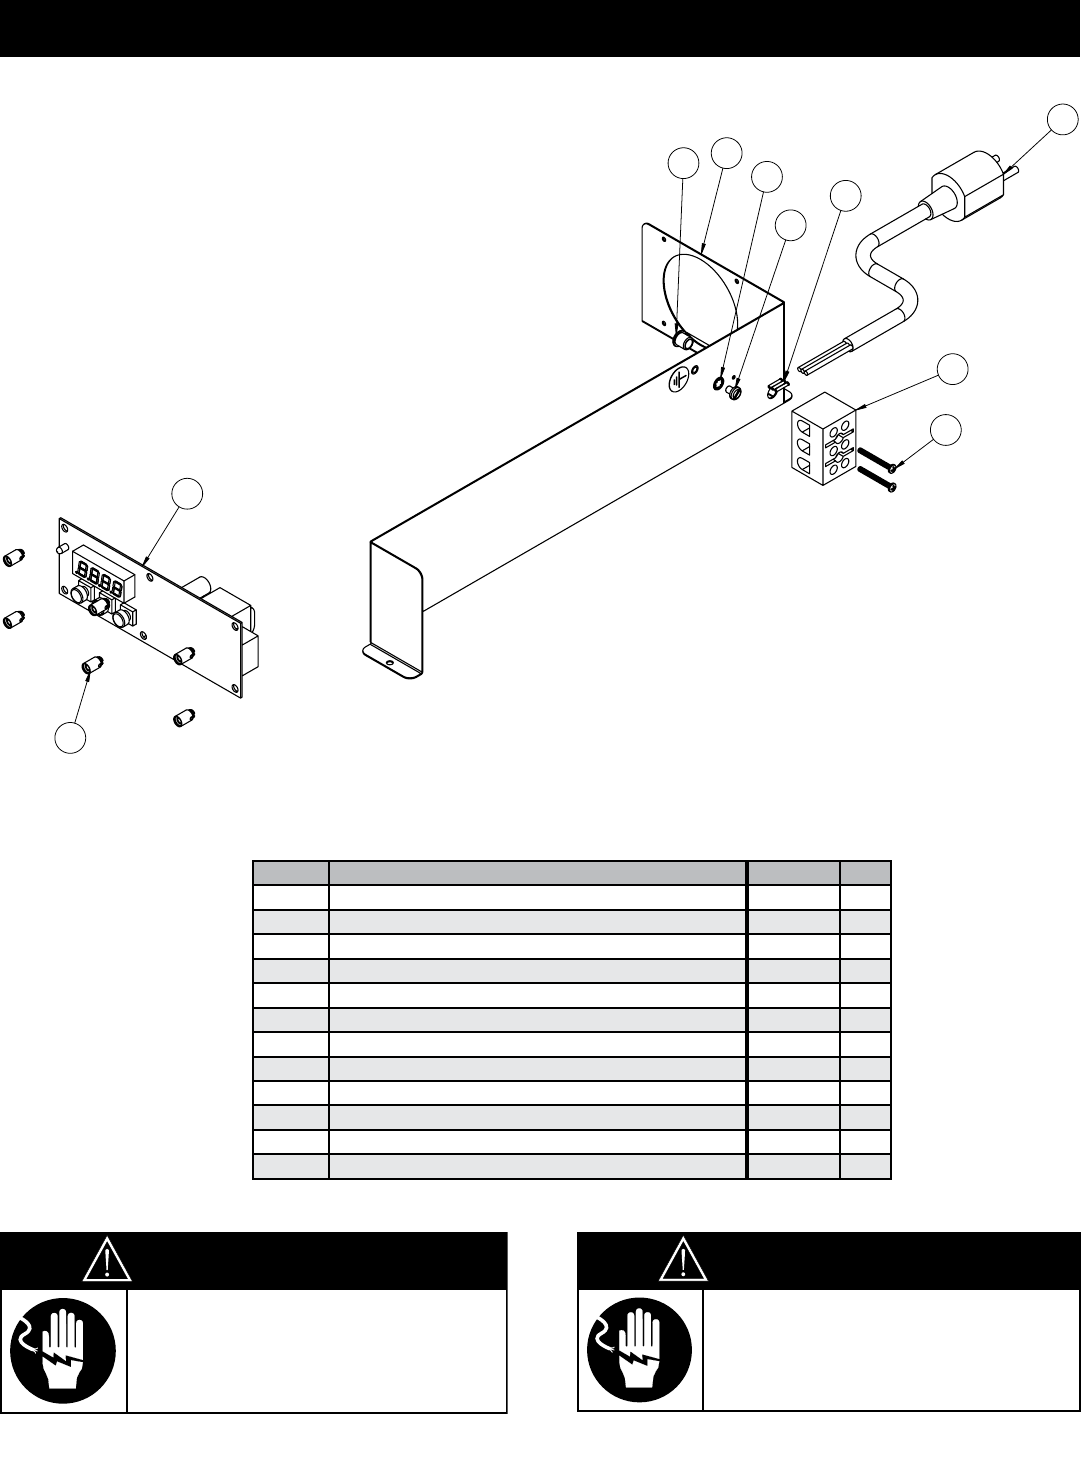 Alto Shaam 1dn Users Manual Wiring Diagram Mn 29742 Rev 1 04 13 Drawer Warmer Installation Operation Service 21